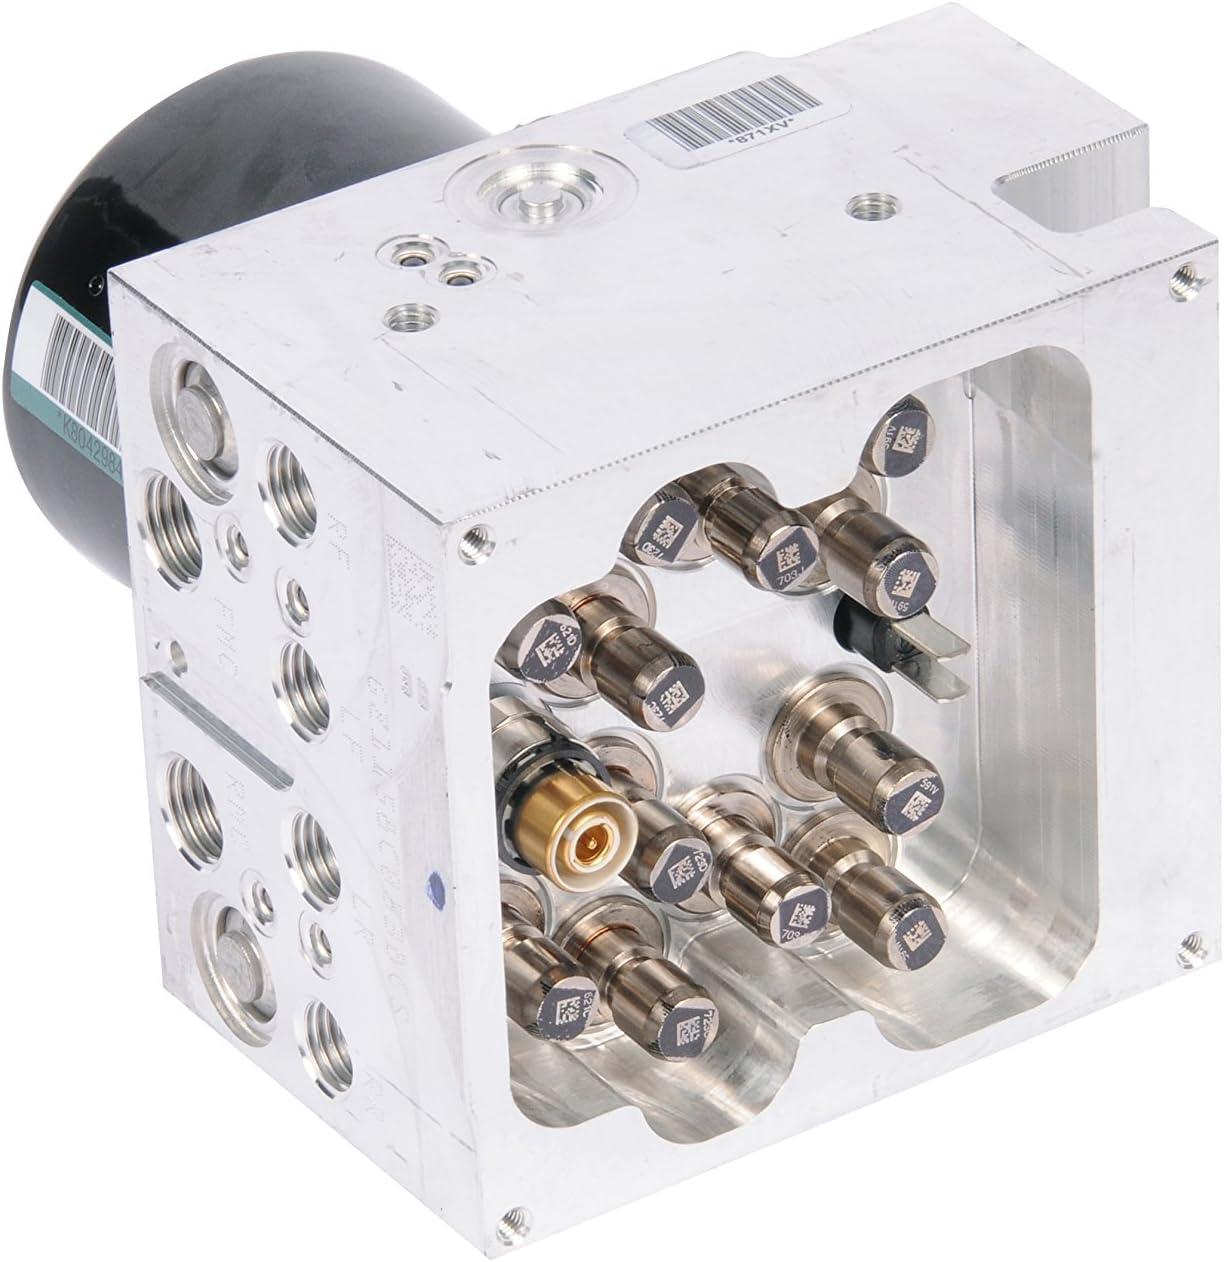 ACDelco GM Original Max 53% OFF Equipment 25879226 ABS Cheap sale Va Modulator Pressure